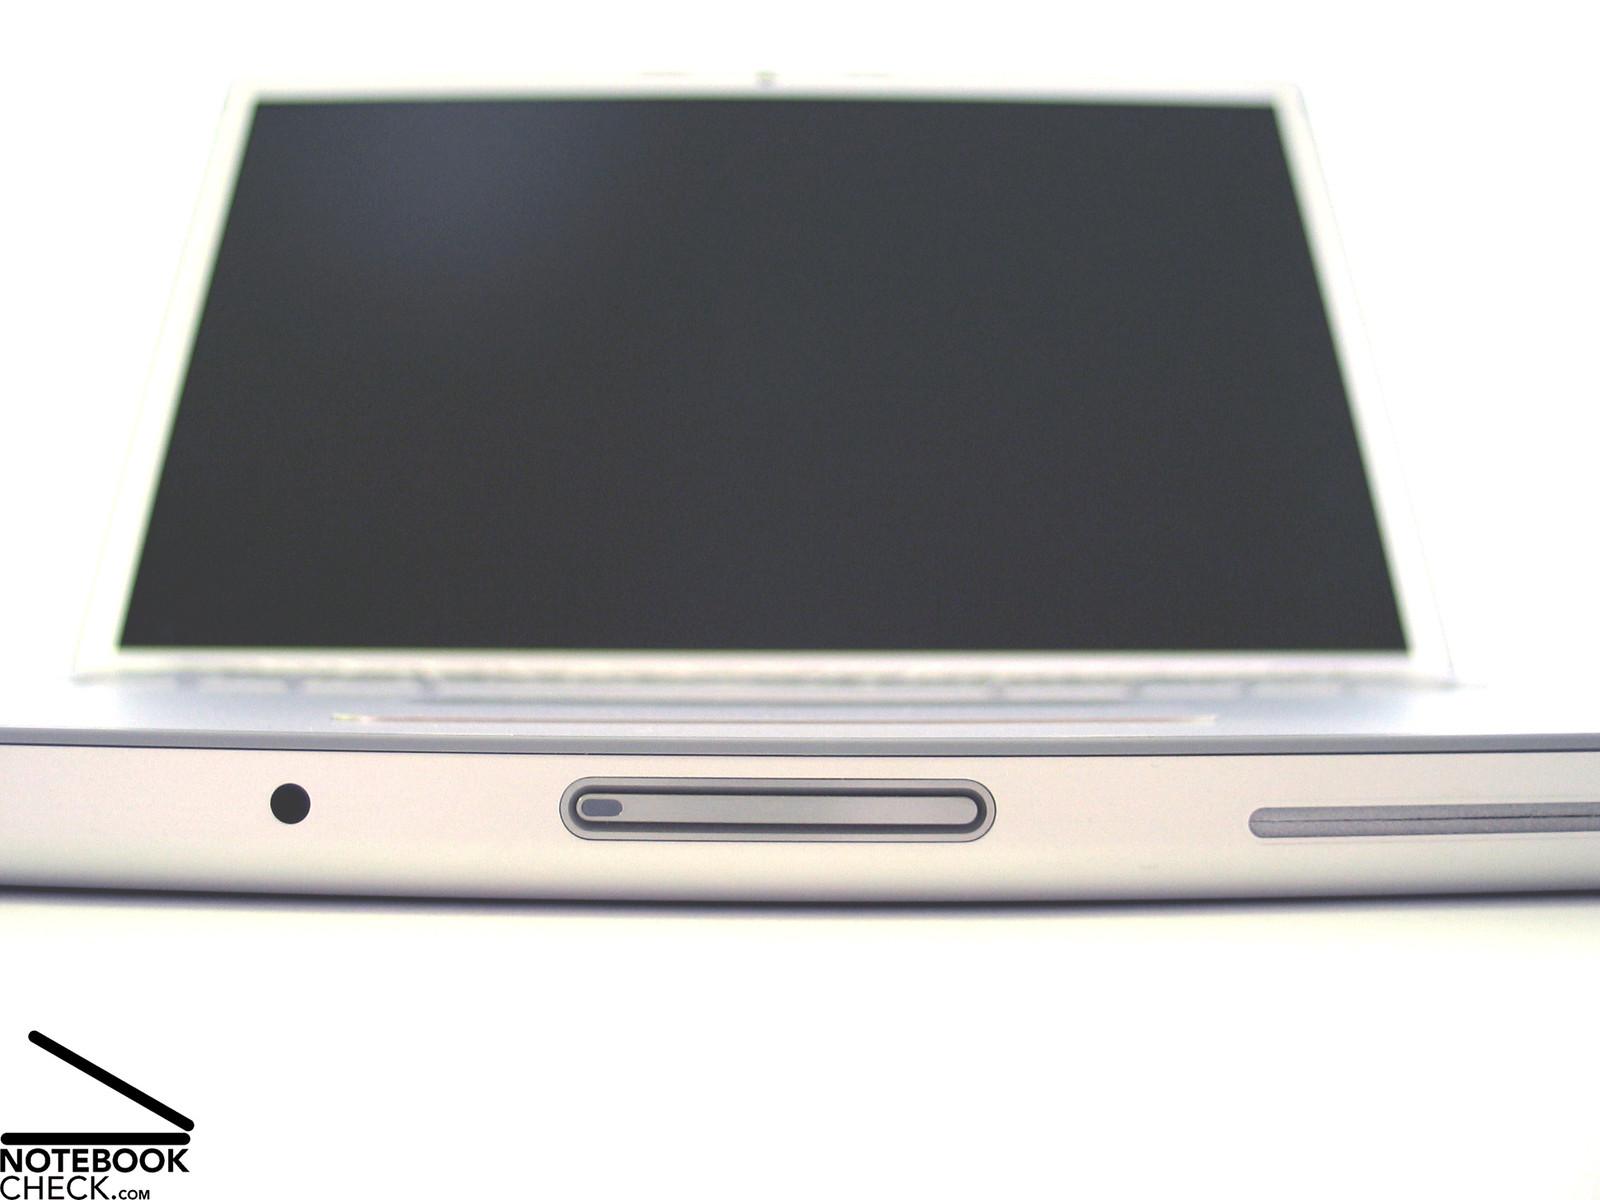 apple macbook pro 15 inch santa rosa. Black Bedroom Furniture Sets. Home Design Ideas